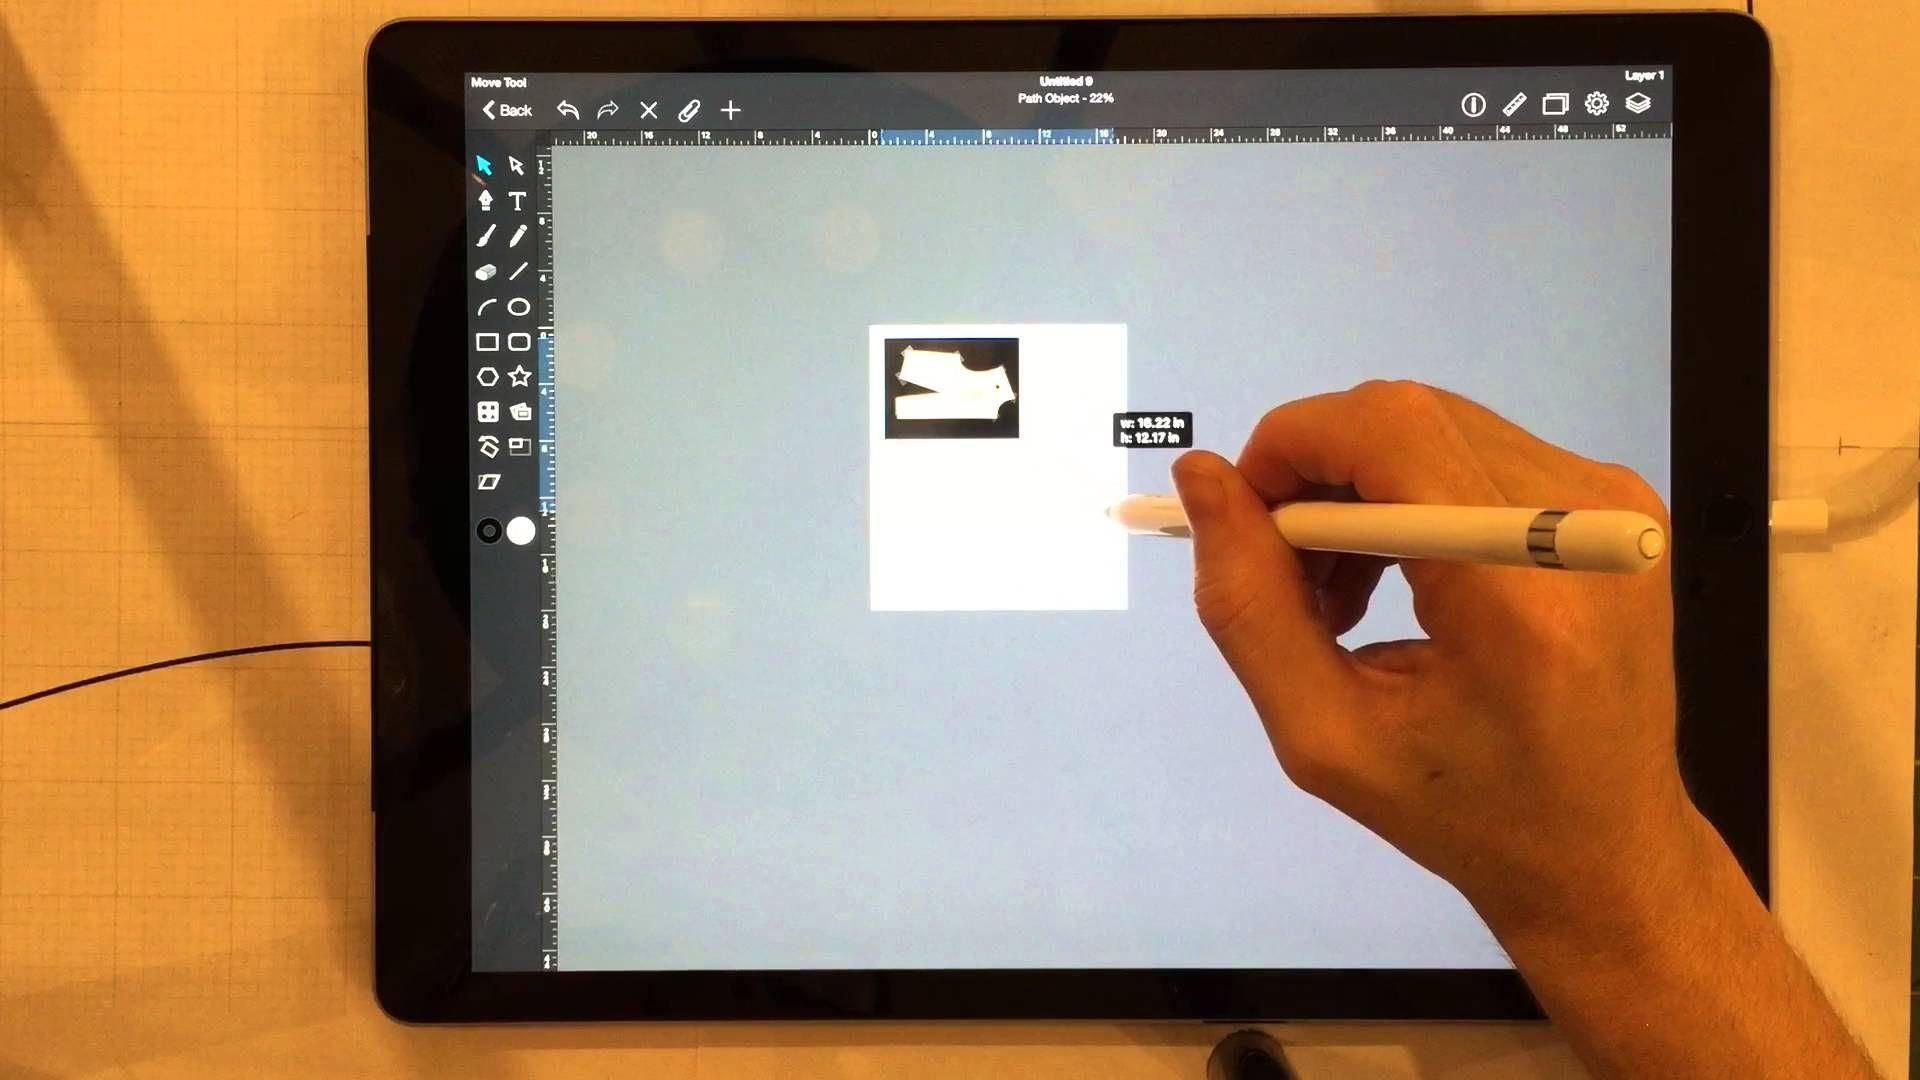 Ipad Pro And Apple Pencil For Fashion Design And Pattern Drafting Digital Fashion Design Pattern Drafting Ipad Art